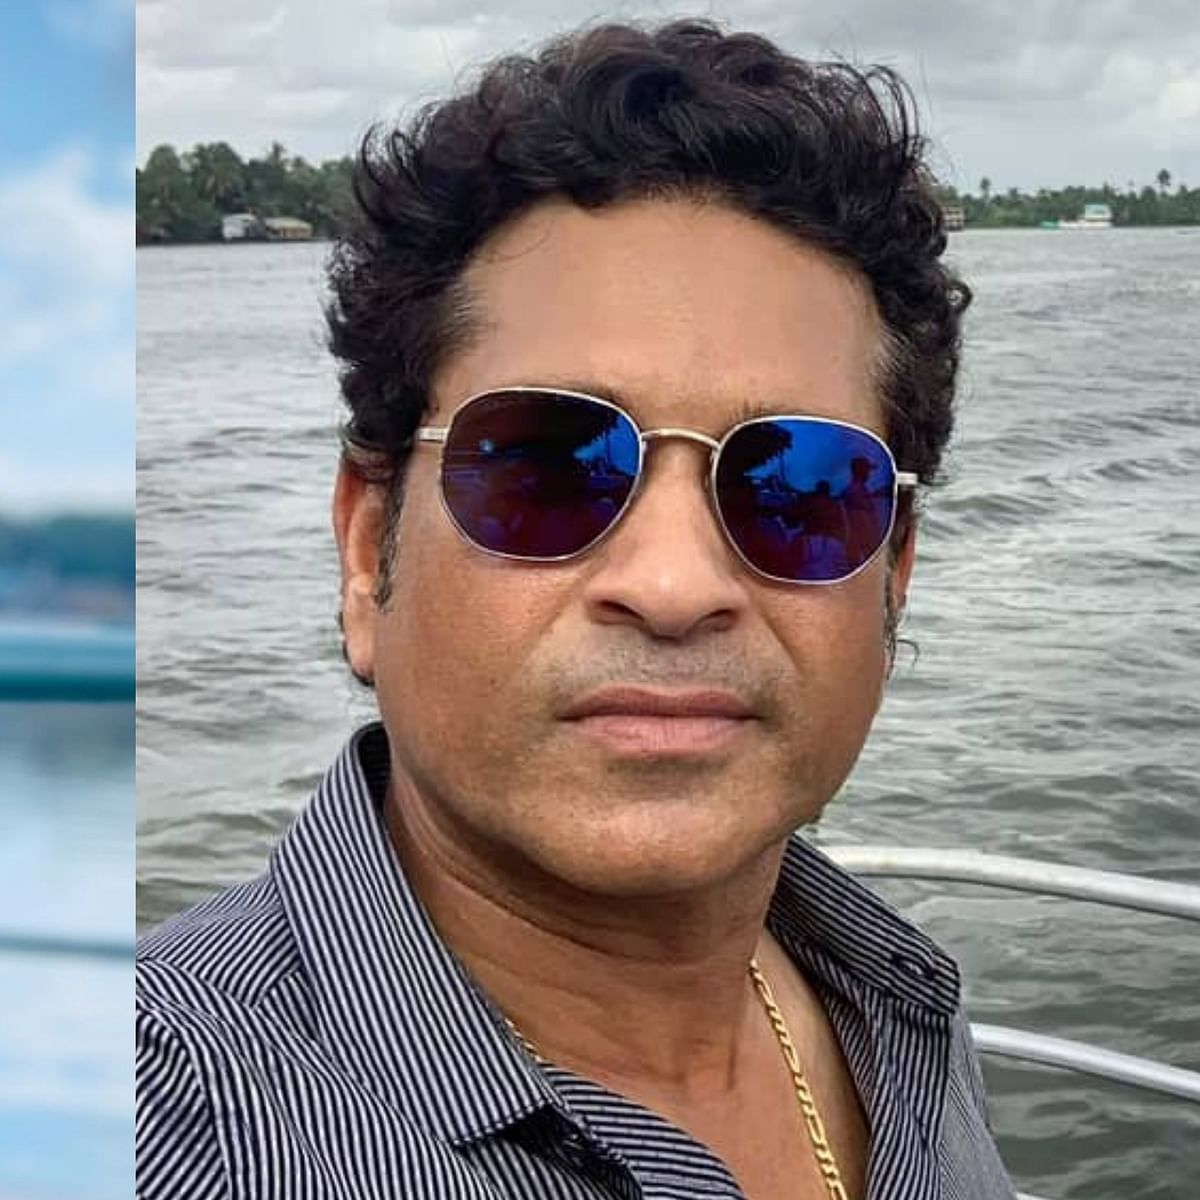 Sachin Tendulkar praises 'Indian Idol', Sona Mohapatra asks if he's aware of #MeToo allegations against Anu Malik